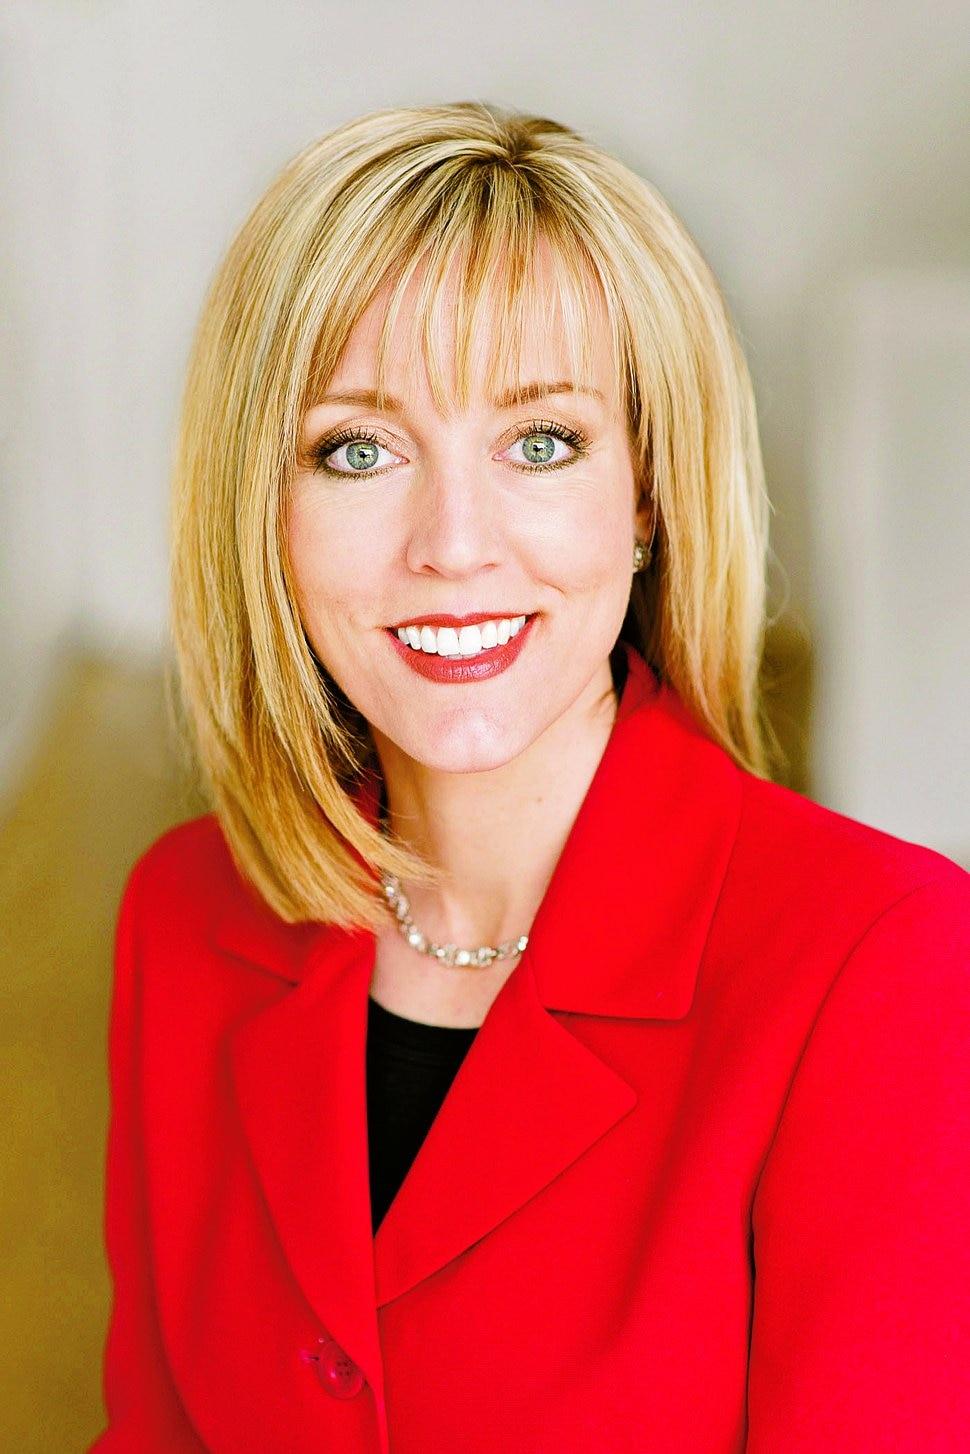 (Photo courtesy of Aimee Winder Newton) Salt Lake County Councilwoman Aimee Winder Newton.